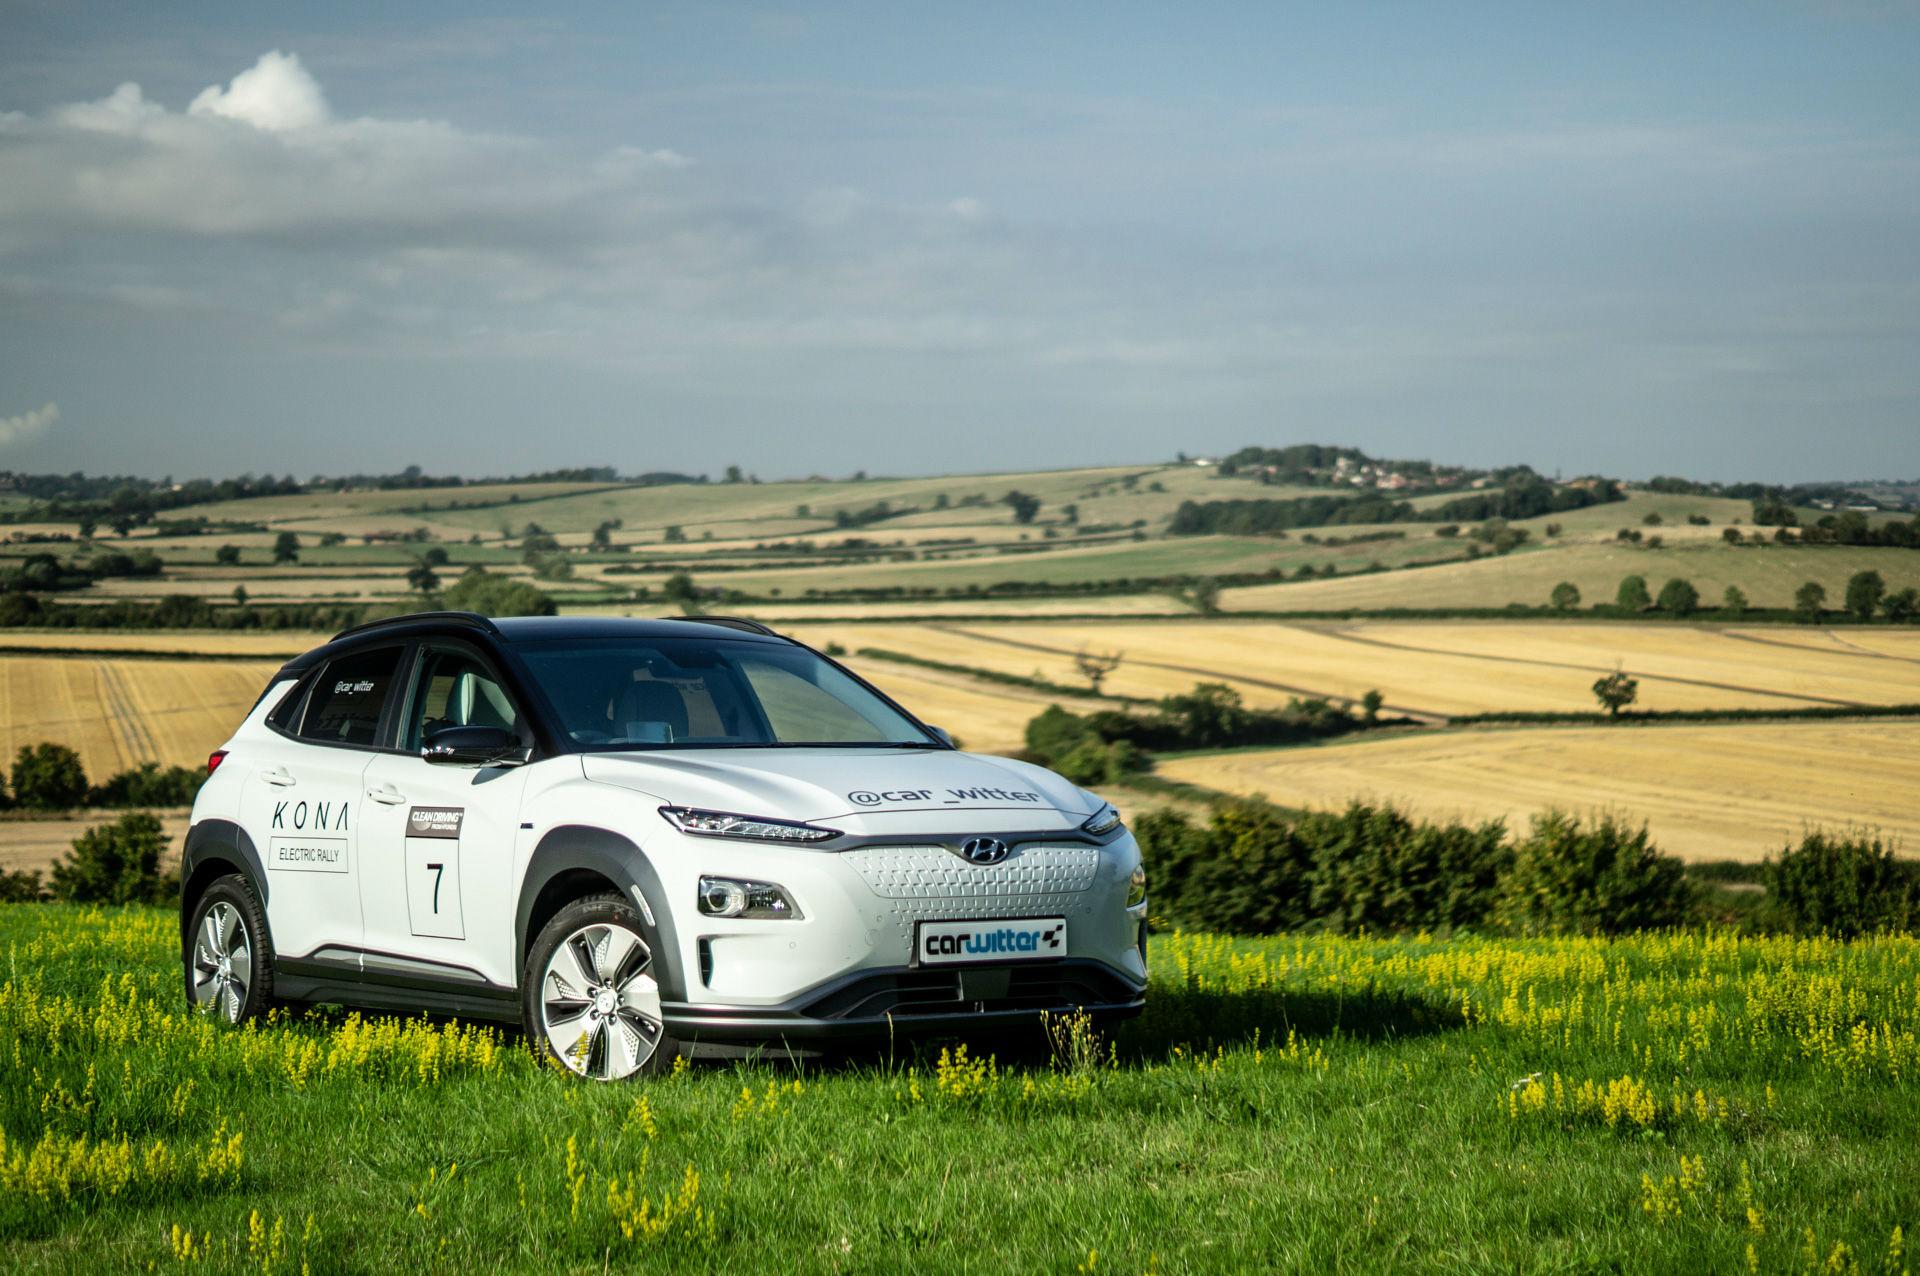 2018 Hyundai Kona Electric 64 KWh Review Main Scene carwitter - Top 10 Best Selling Cars in Ireland 2020 - Top 10 Best Selling Cars in Ireland 2020